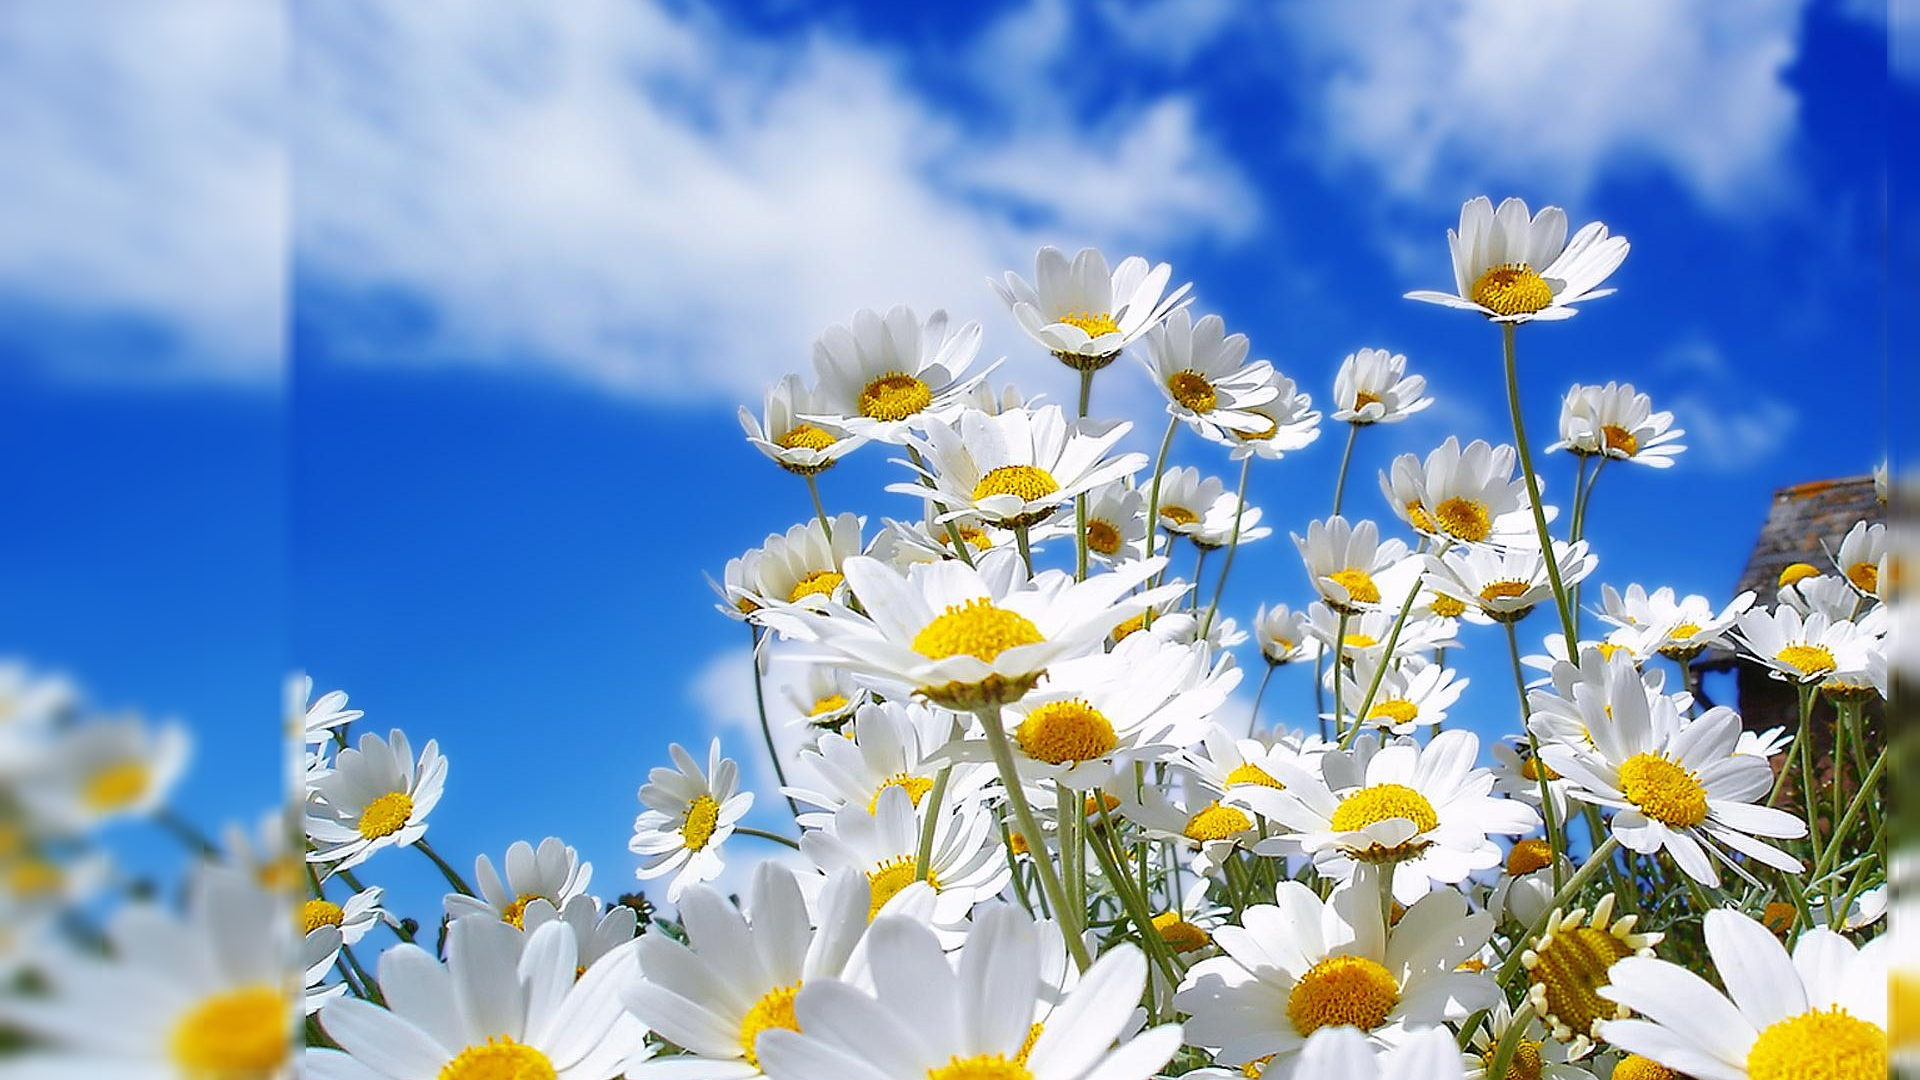 Flowers Wallpapers For Desktop Background 158607   HD Wallpaper 1920x1080